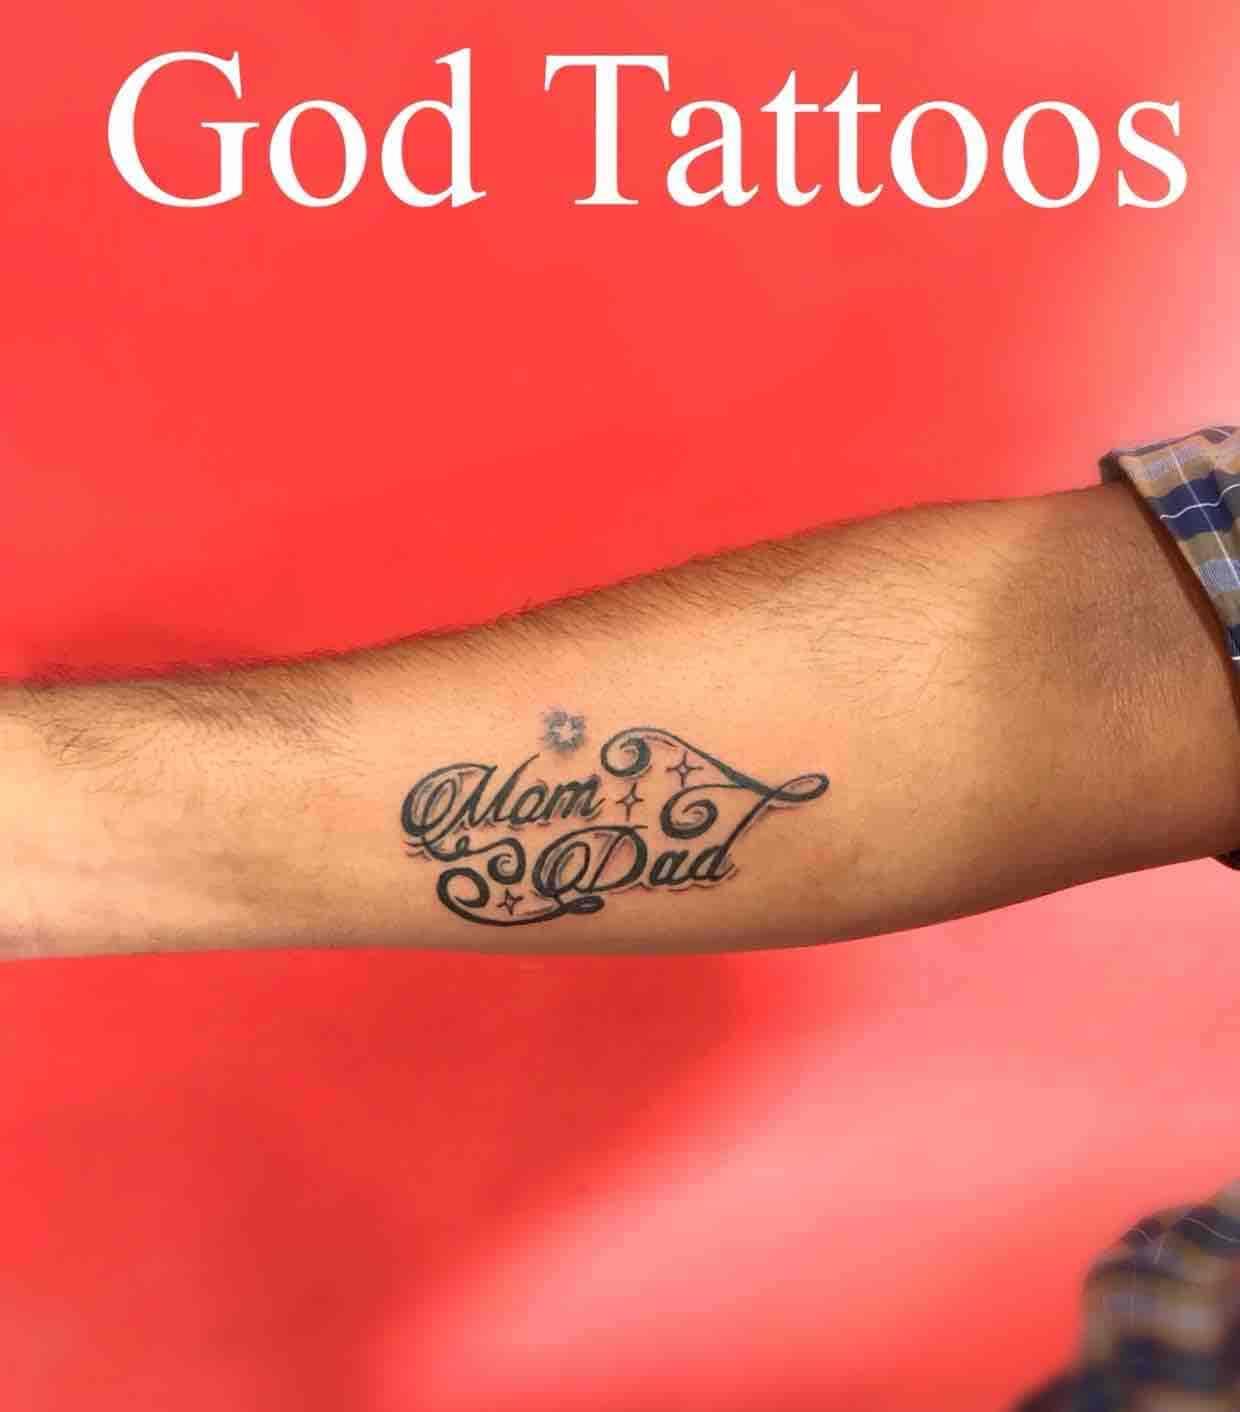 d9a935681 God Tattoos, Saligramam - Tattoo Parlours in Chennai - Justdial